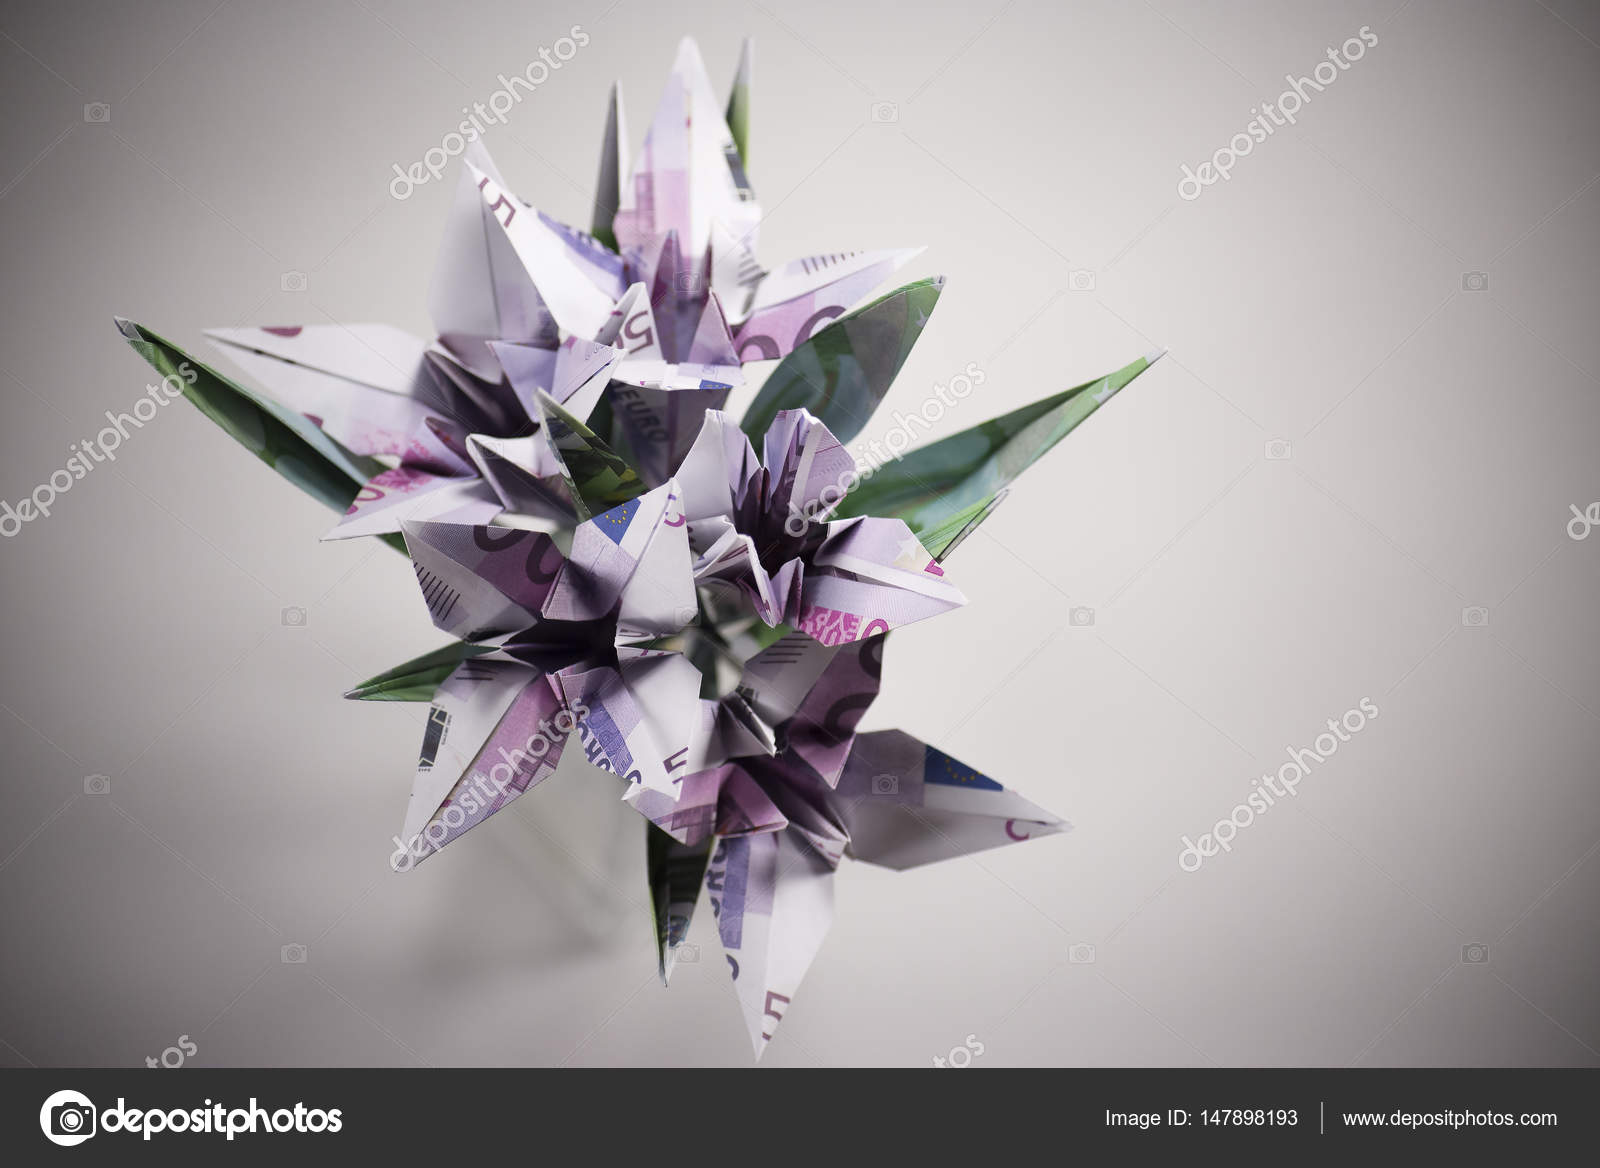 Flowers Origami Banknotes Stock Photo Artbutenkov 147898193